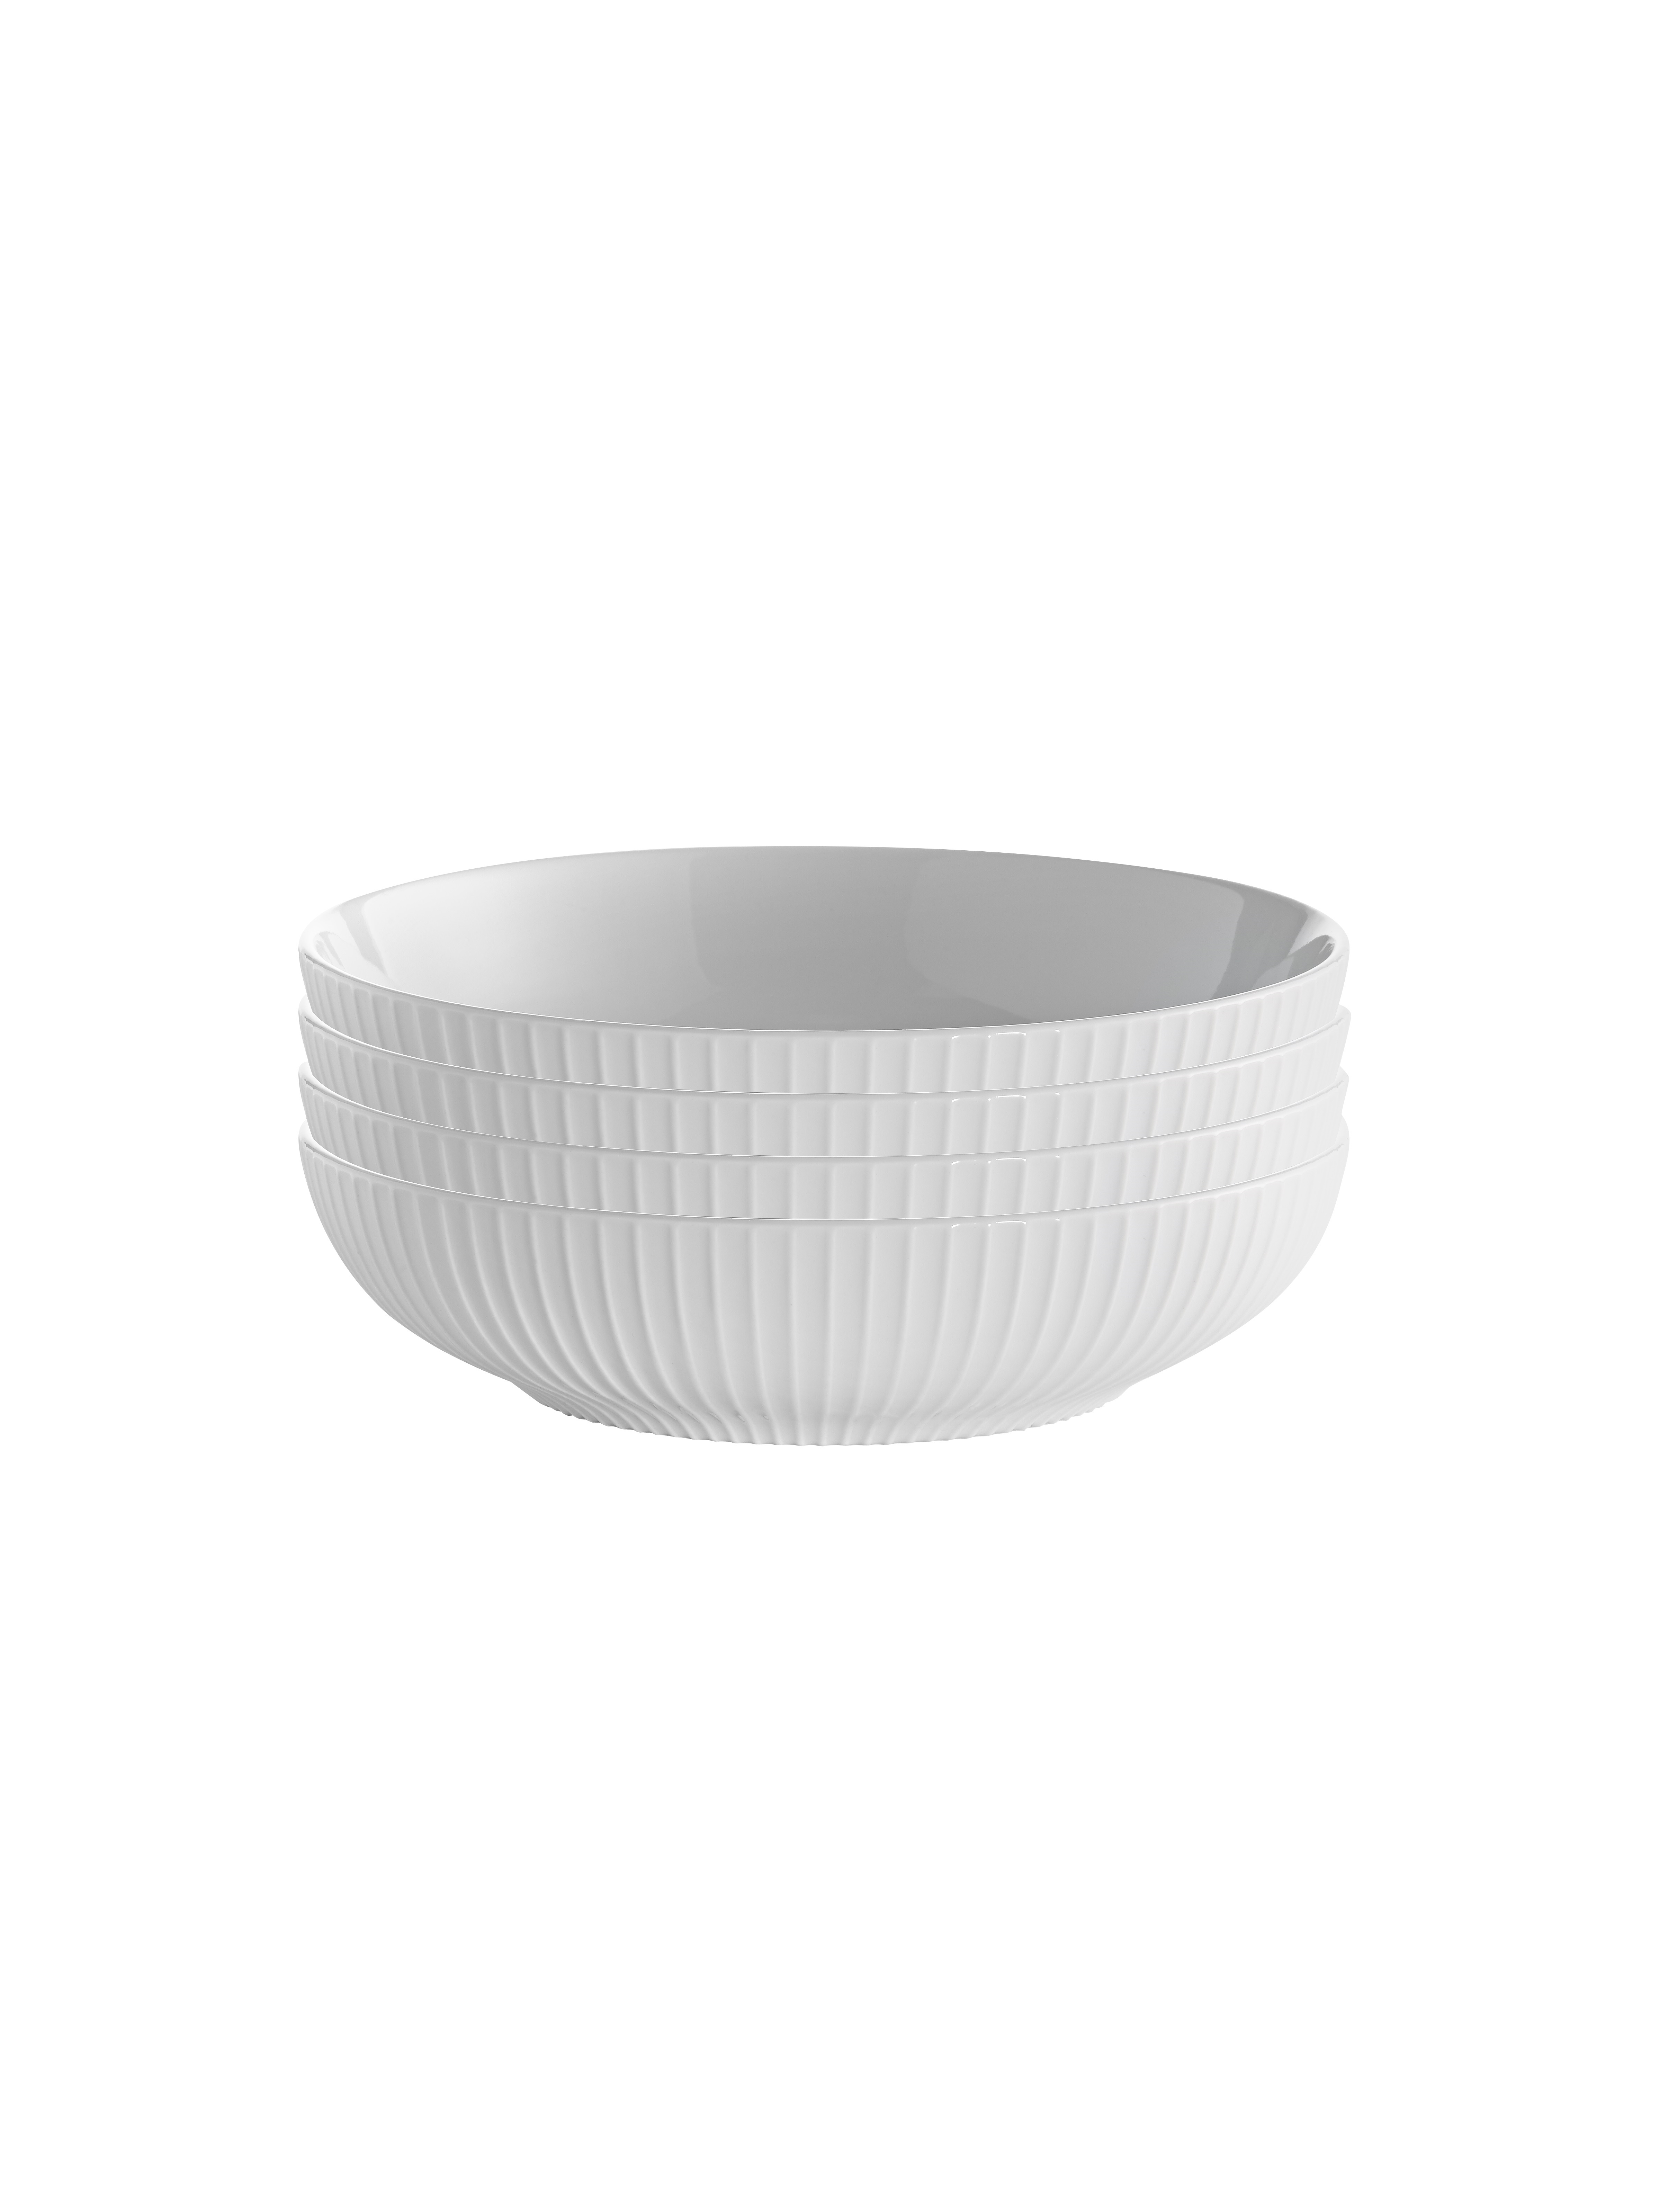 overandback Porcelain Textured Pasta Bowls, Set of 4, white by Over & Back